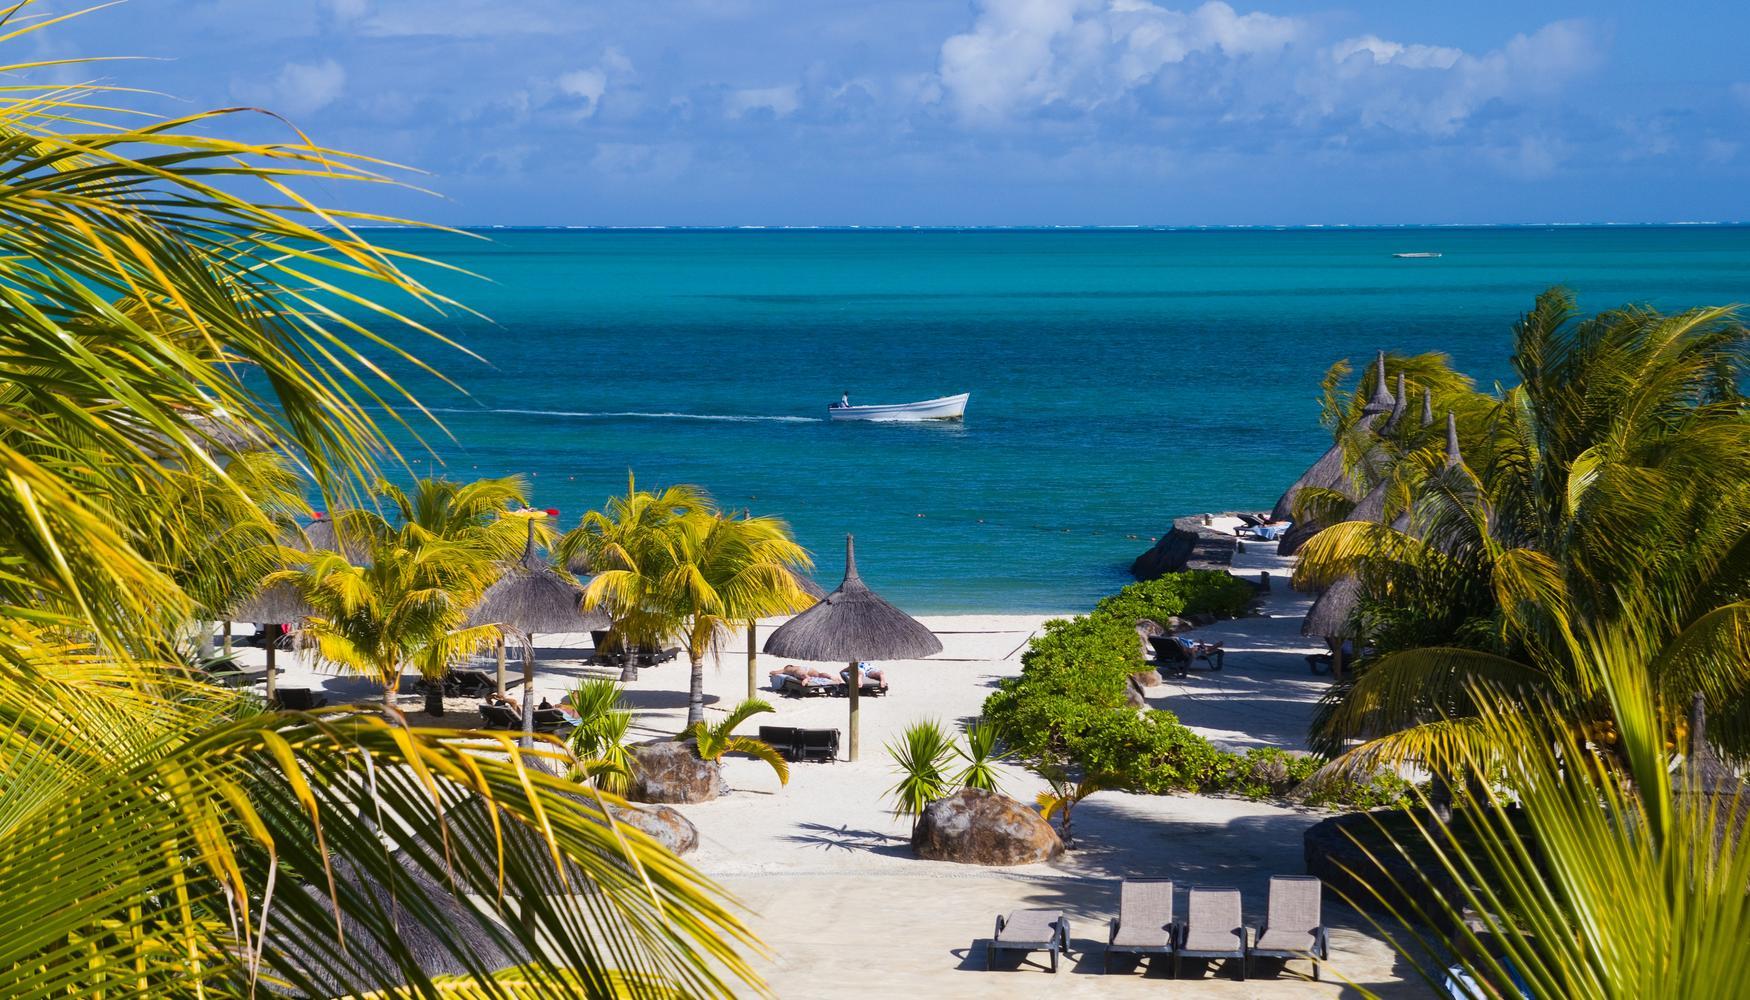 Coches de alquiler en Mauricio